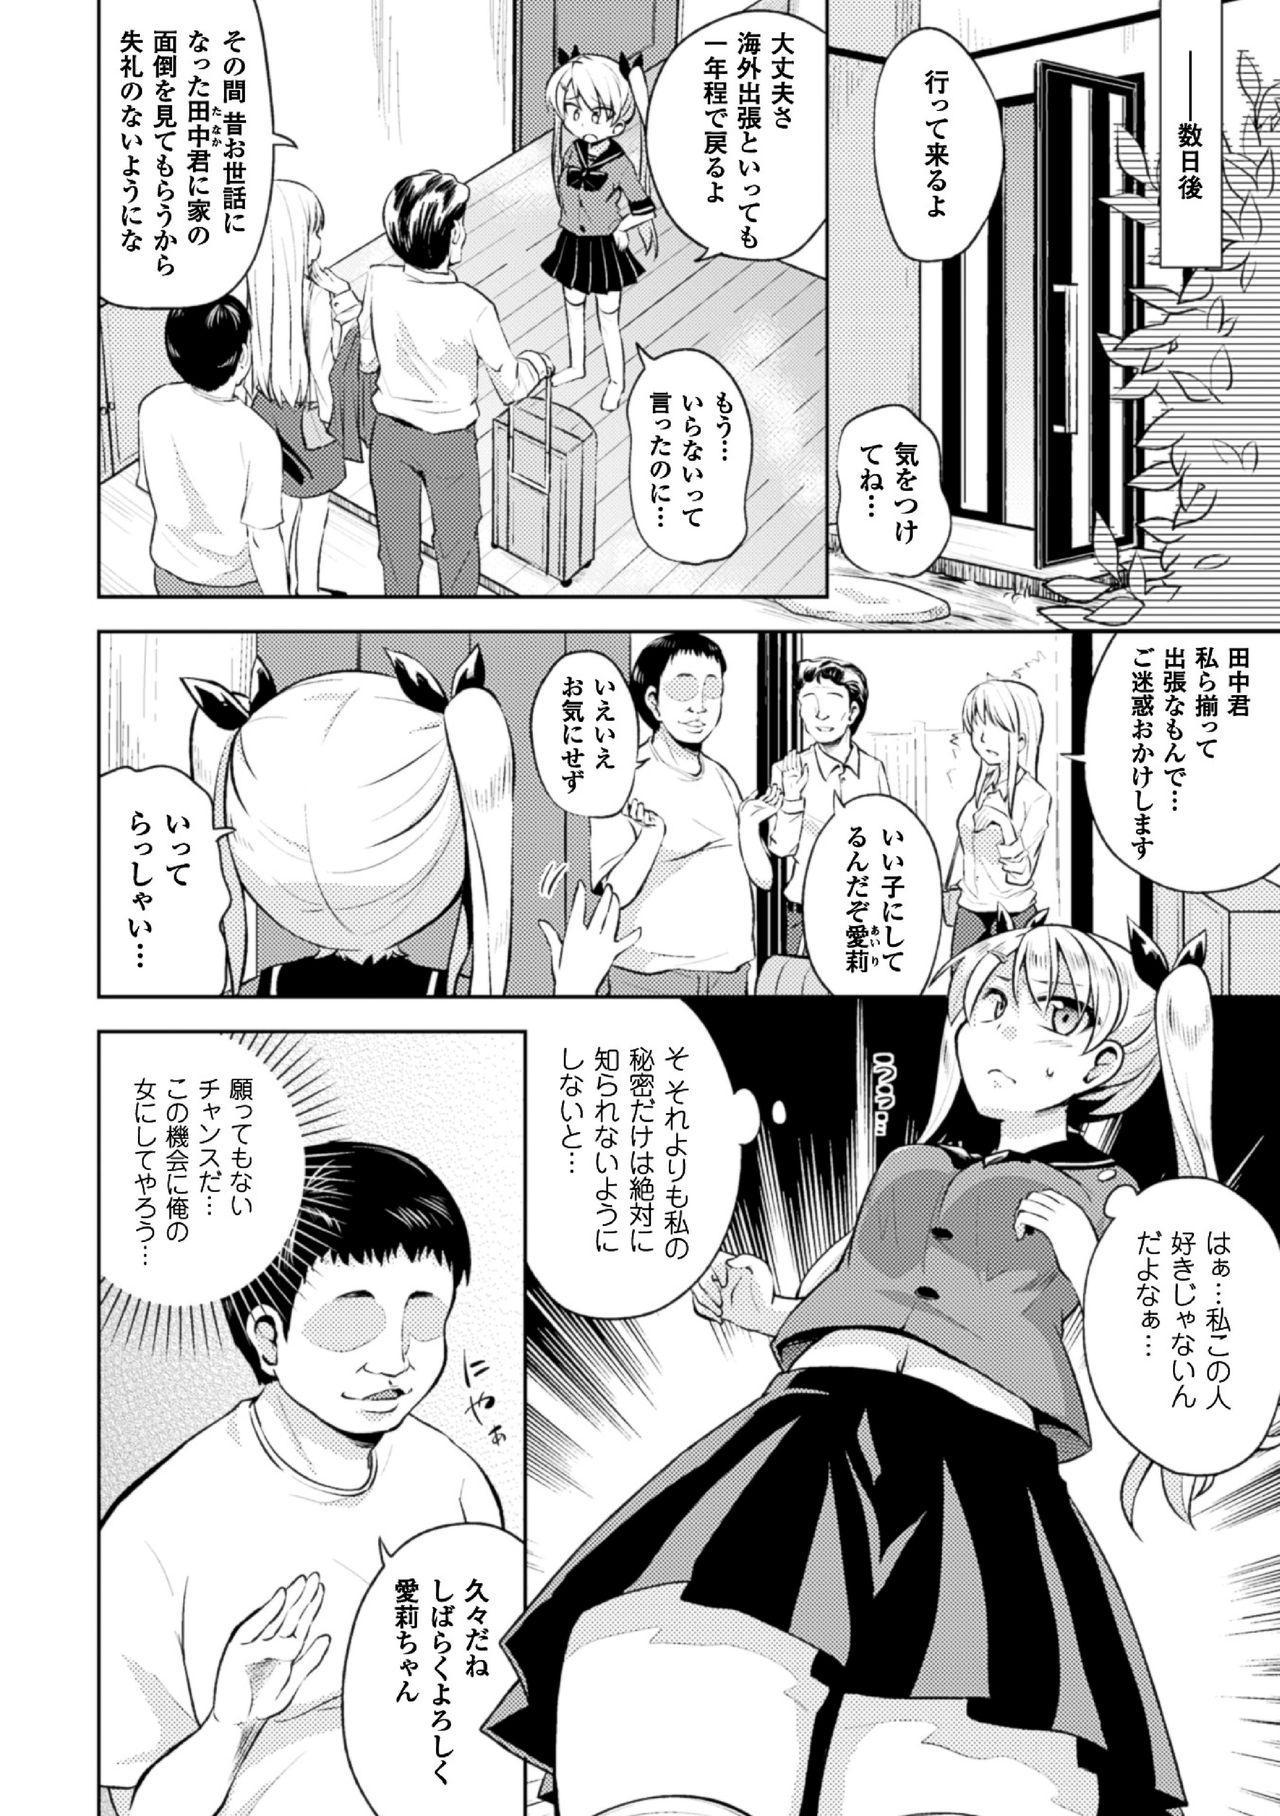 2D Comic Magazine Futanari Musume ni Nakadashi Haramase! Vol. 1 45